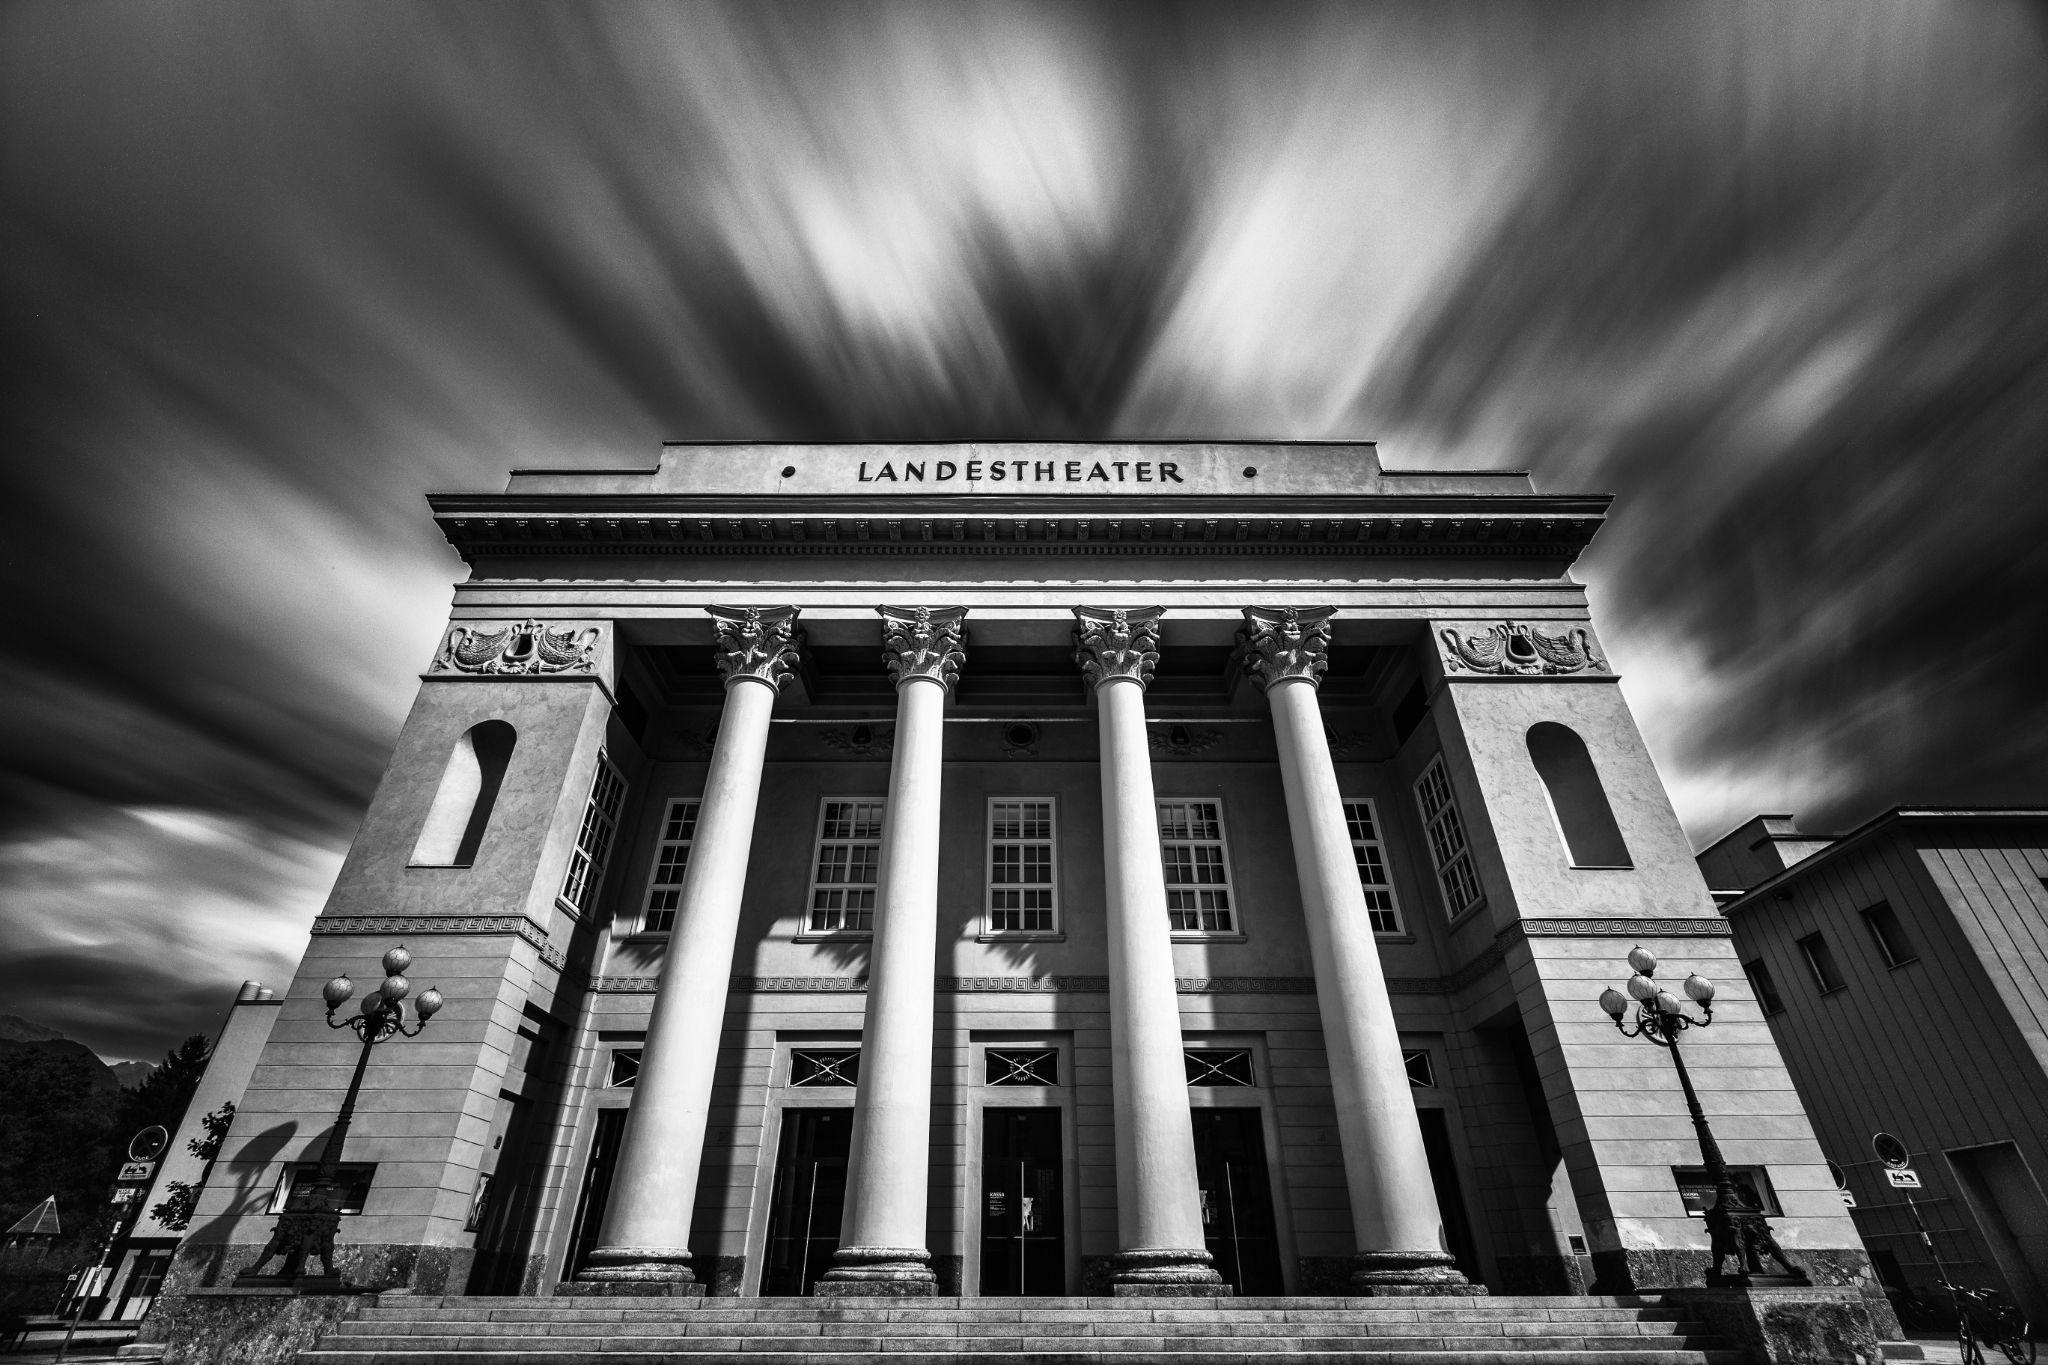 Landestheater Innsbruck by Fabian Irsara